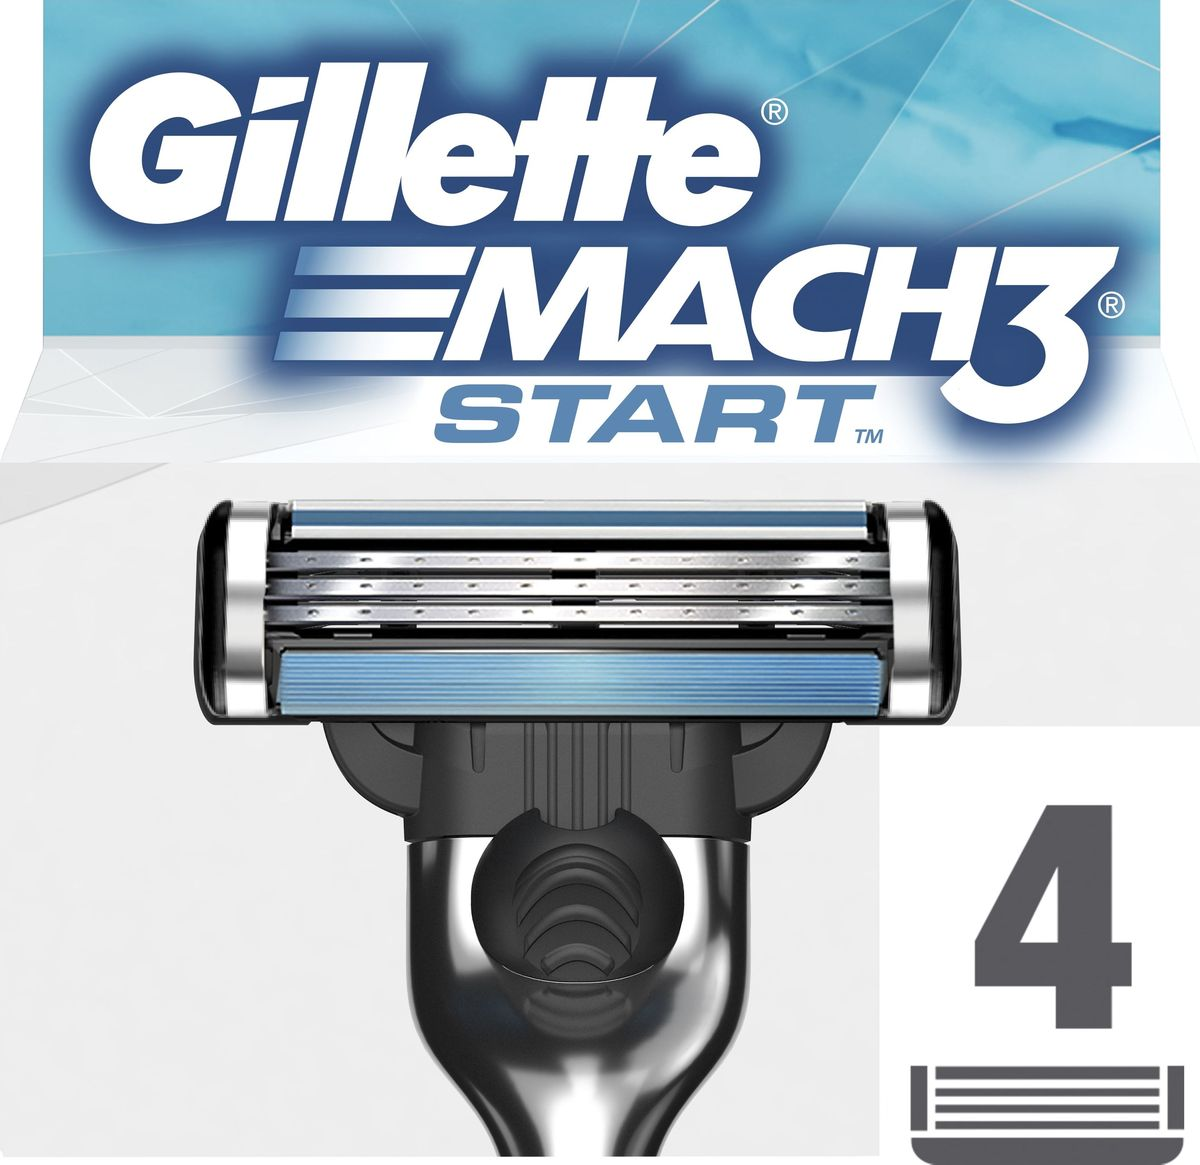 Gillette Mach 3 Start Сменные кассеты для бритвы, 4 шт